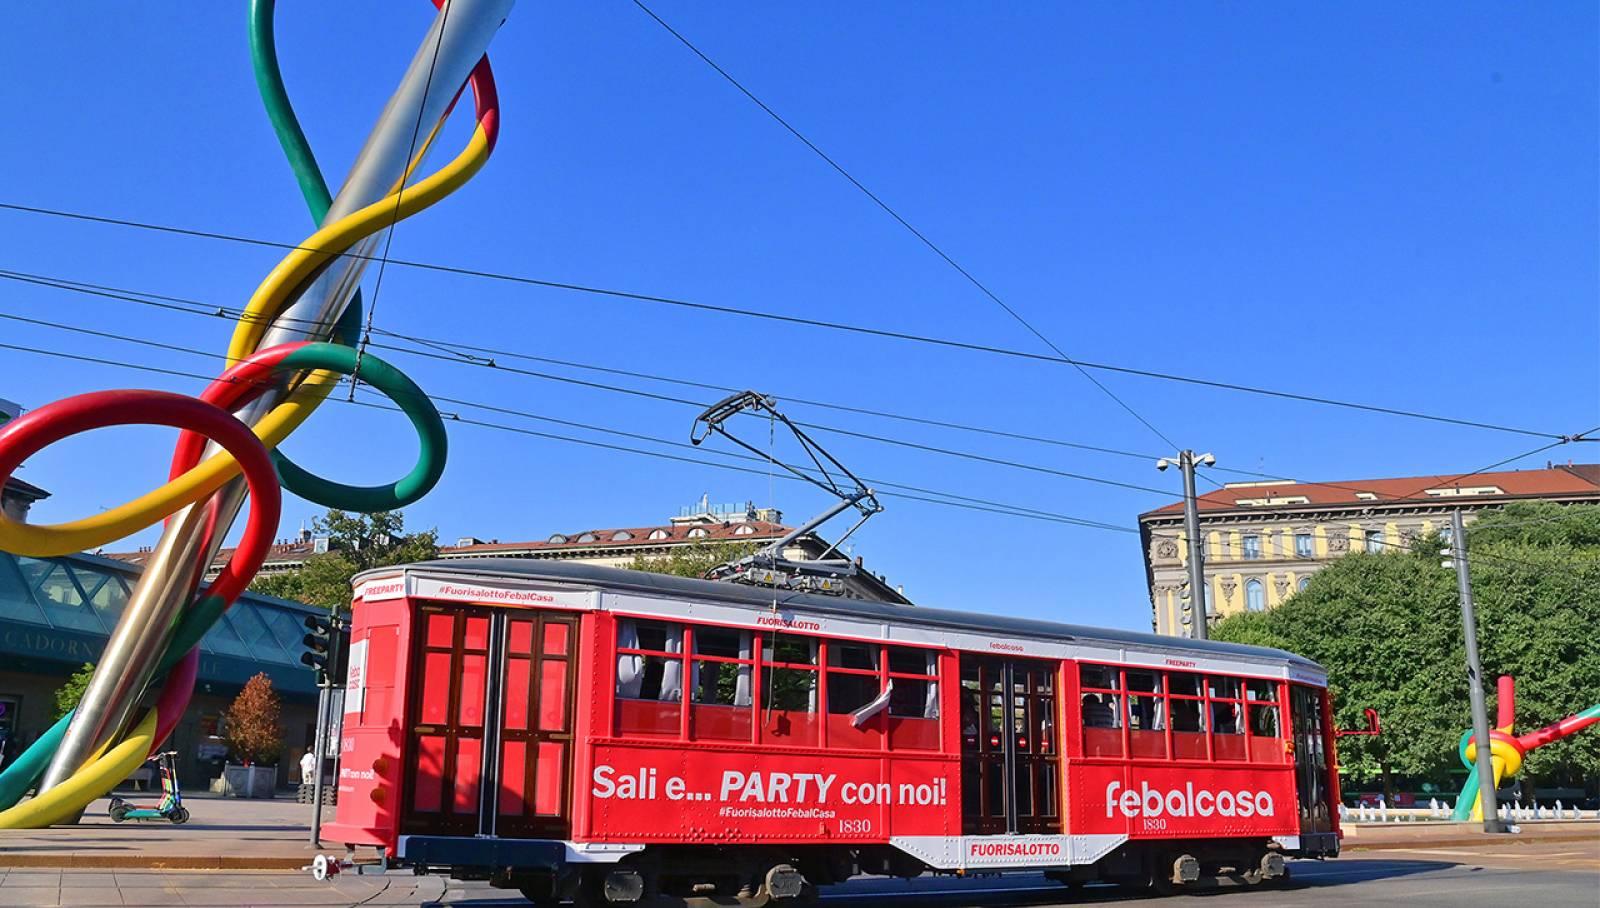 Tram Creative Solutions Milano per Febal Casa